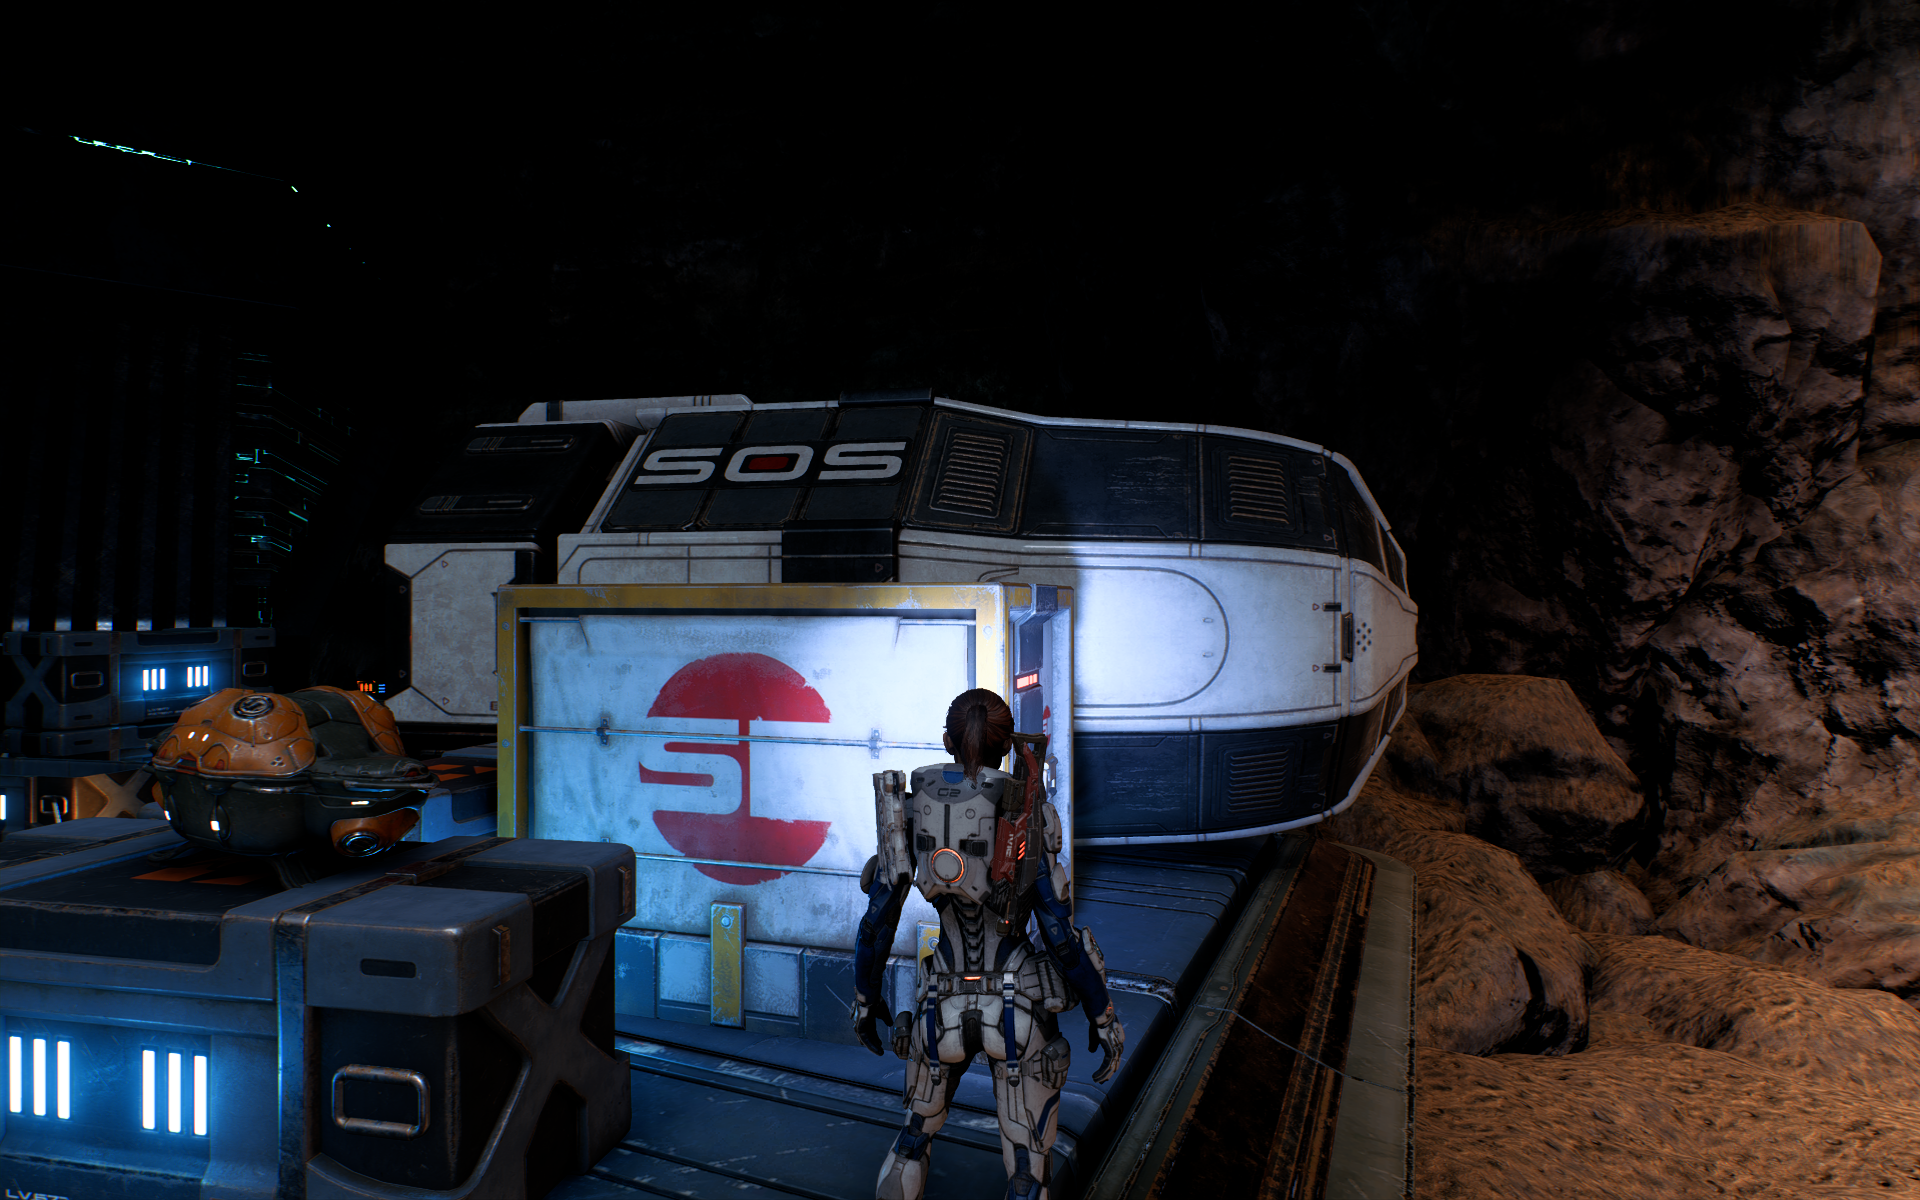 Mass Effect Andromeda Screenshot  - 18.37.37.59.png - Mass Effect: Andromeda